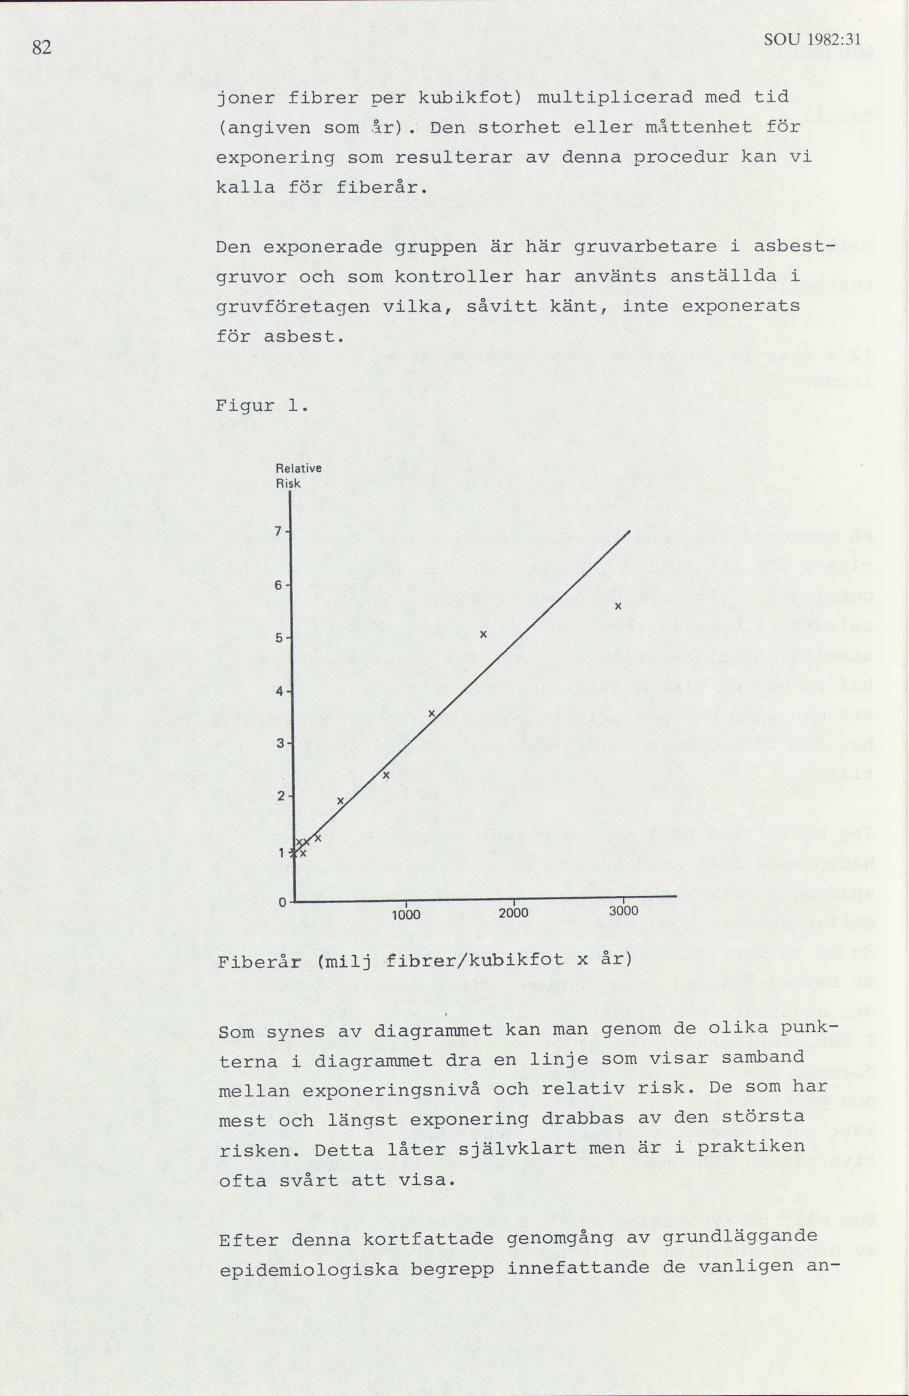 radioaktiva kol dating ekvation